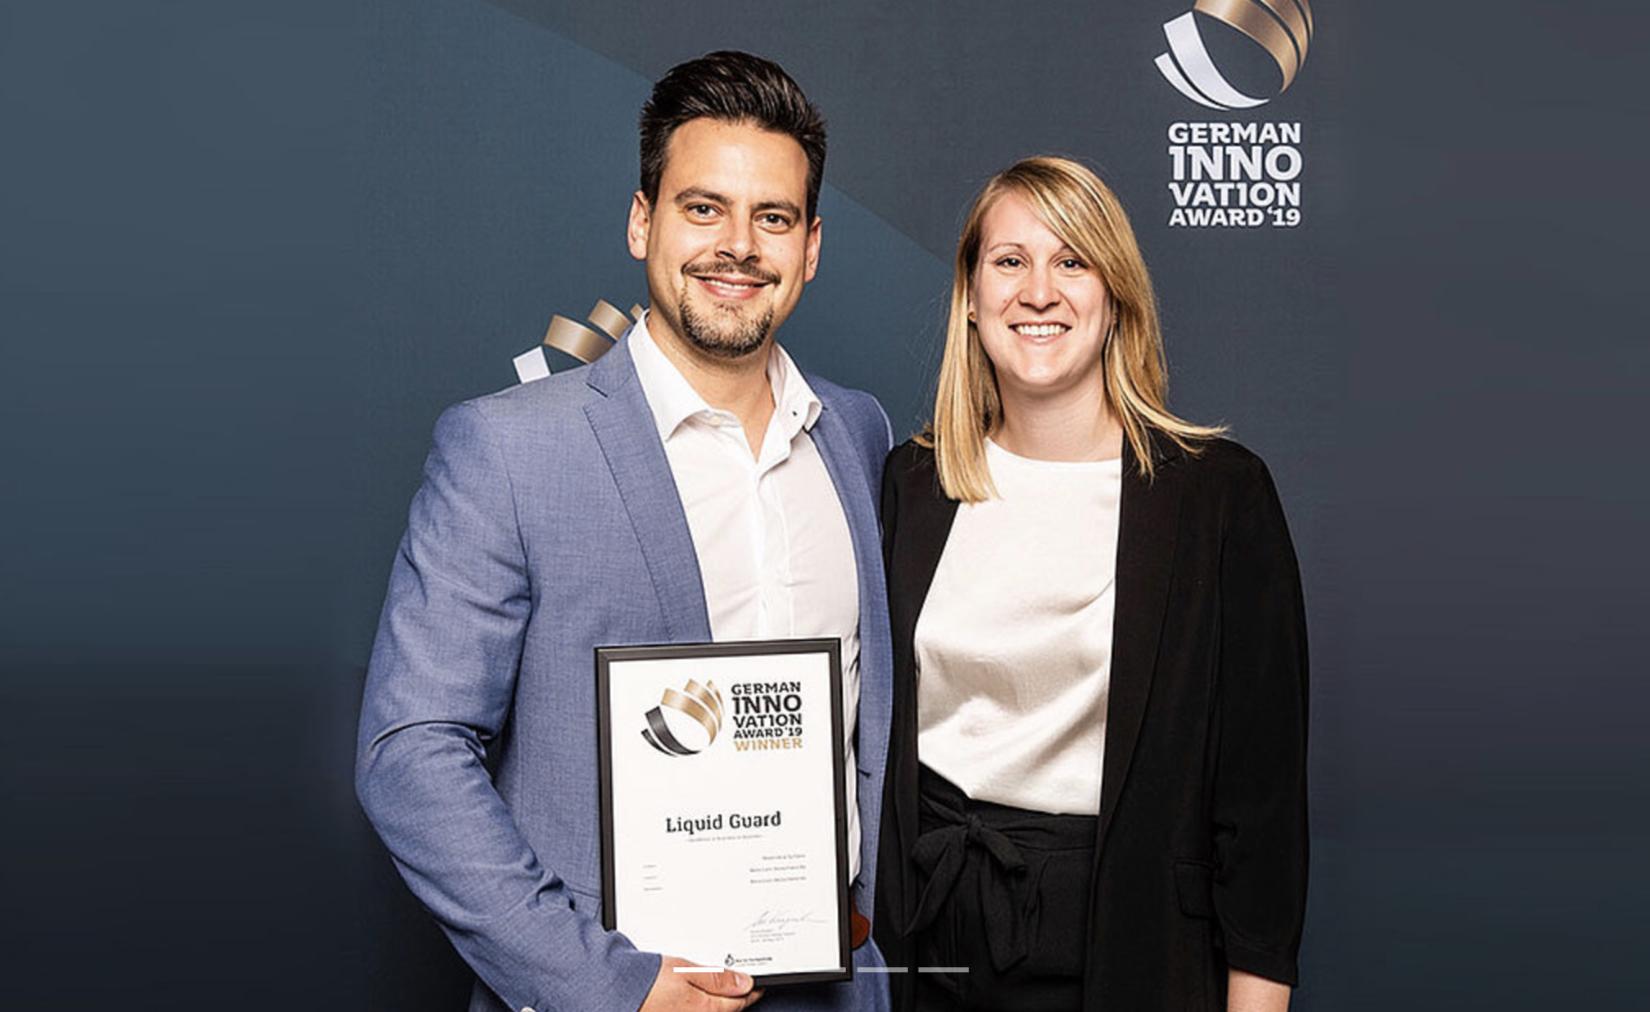 Prix de l'innovation allemande 2019